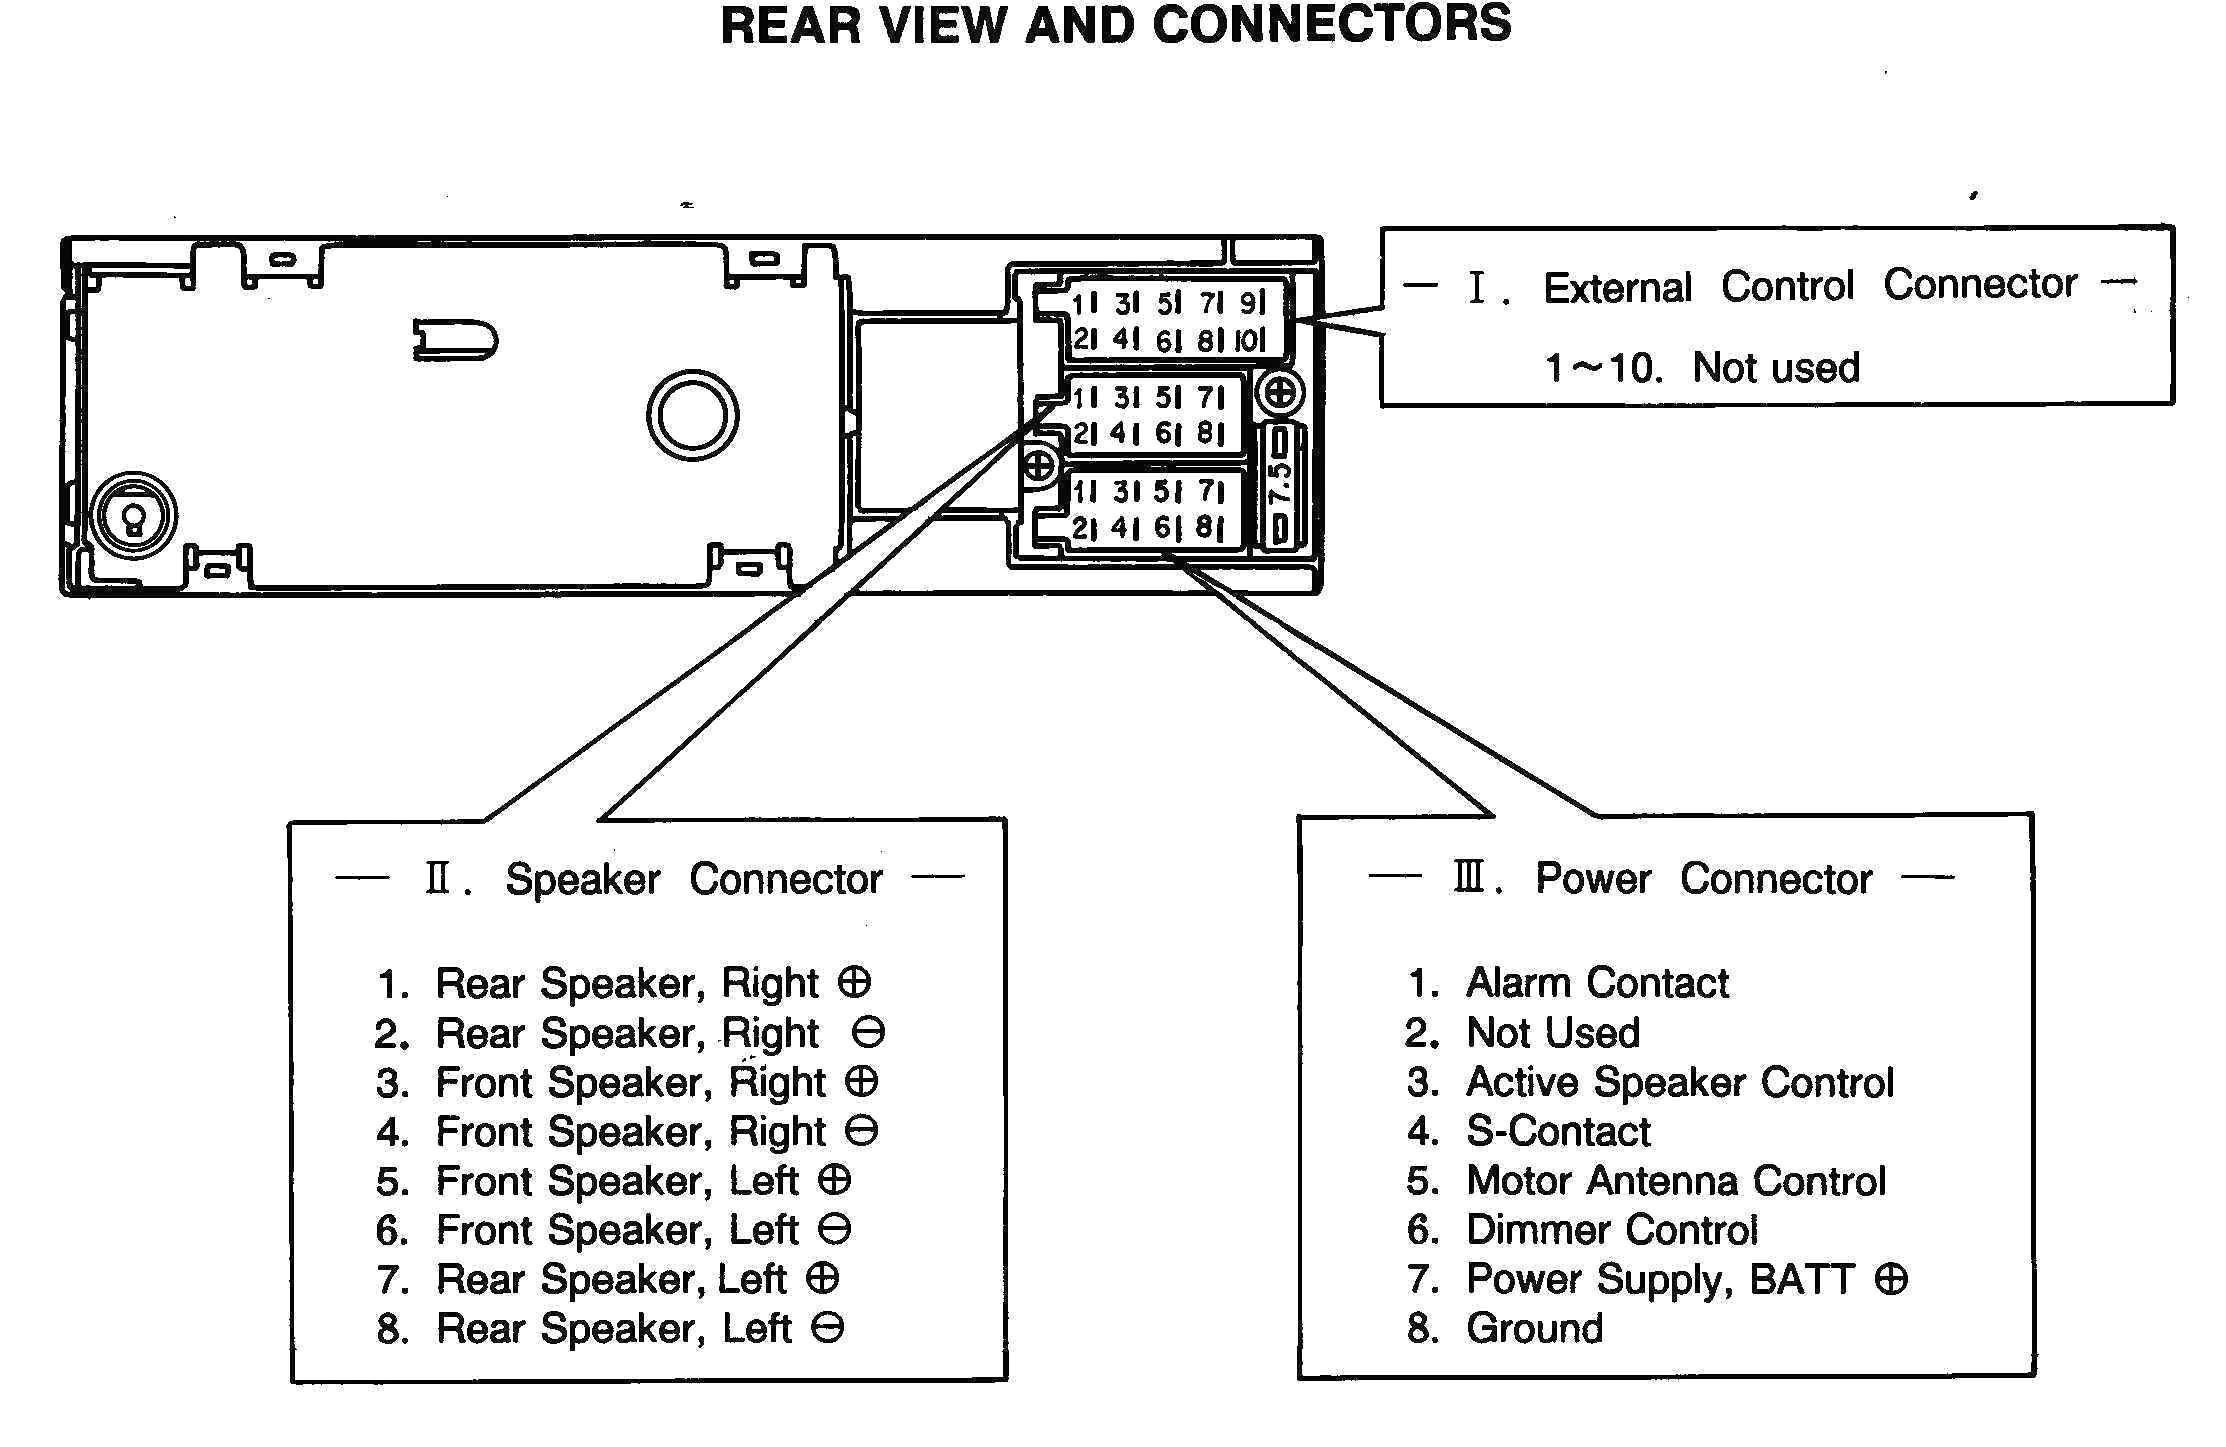 Vw Passat Engine Diagram Vw Stereo Wiring Harness Experts Wiring Diagram • Of Vw Passat Engine Diagram